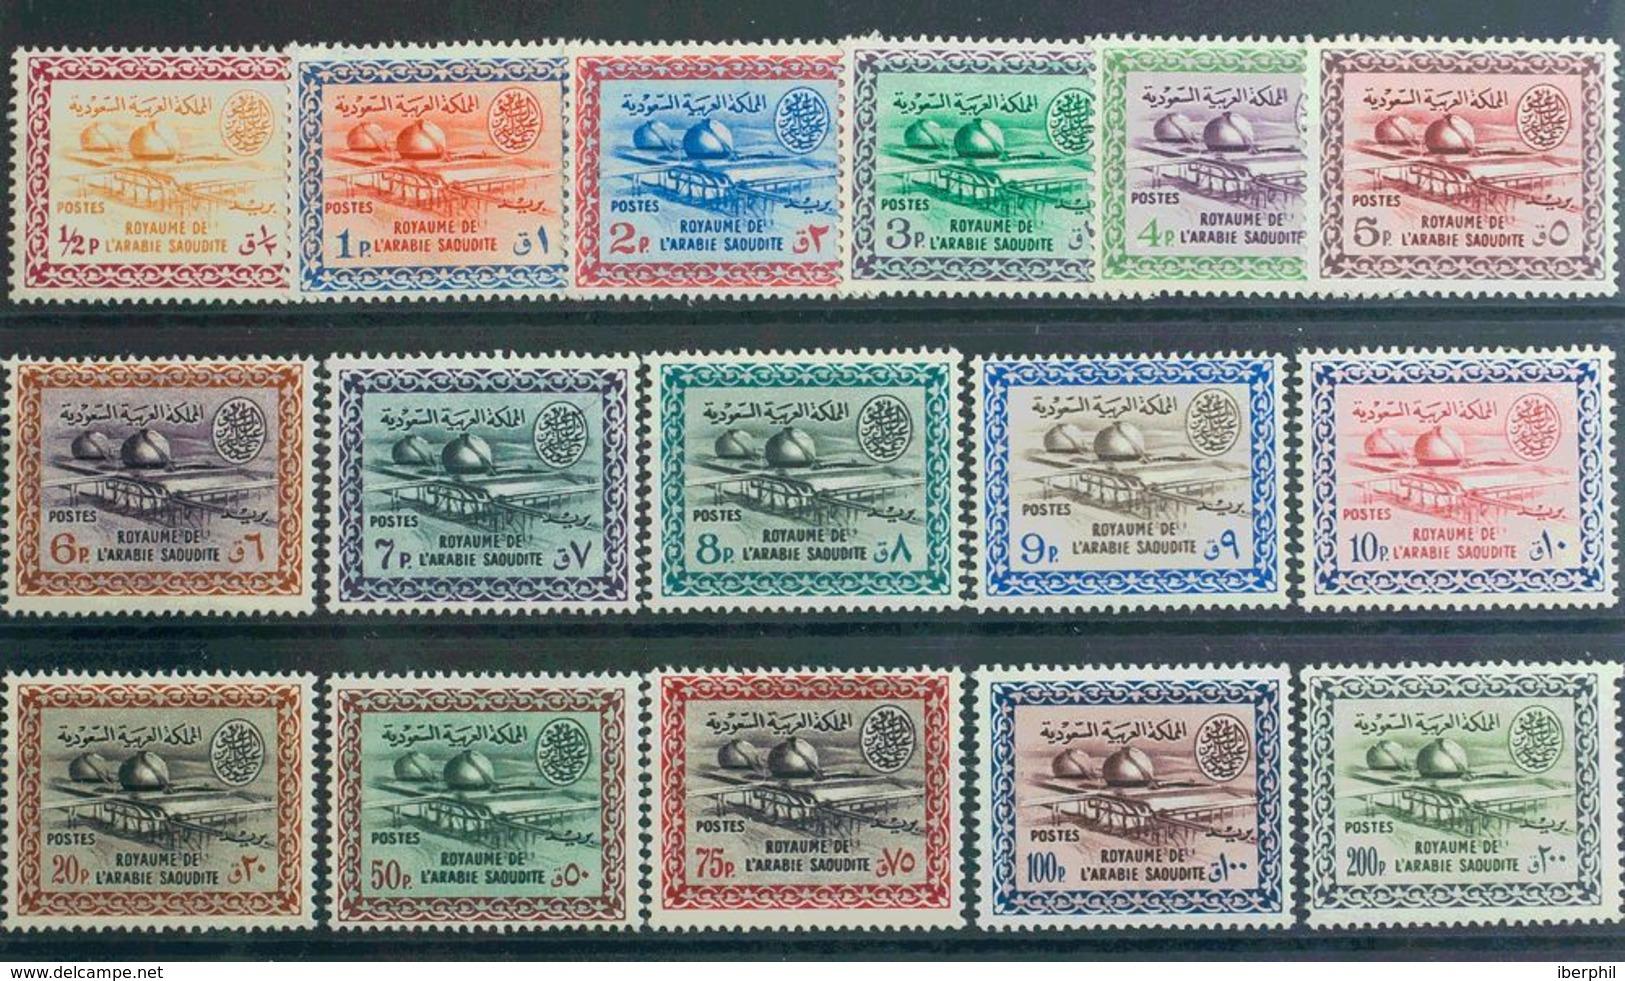 Arabia Saudita. MNH **Yv 178/93. 1961. Serie Completa. MAGNIFICA Y RARA. Yvert 2011: 320 Euros. - Arabia Saudita